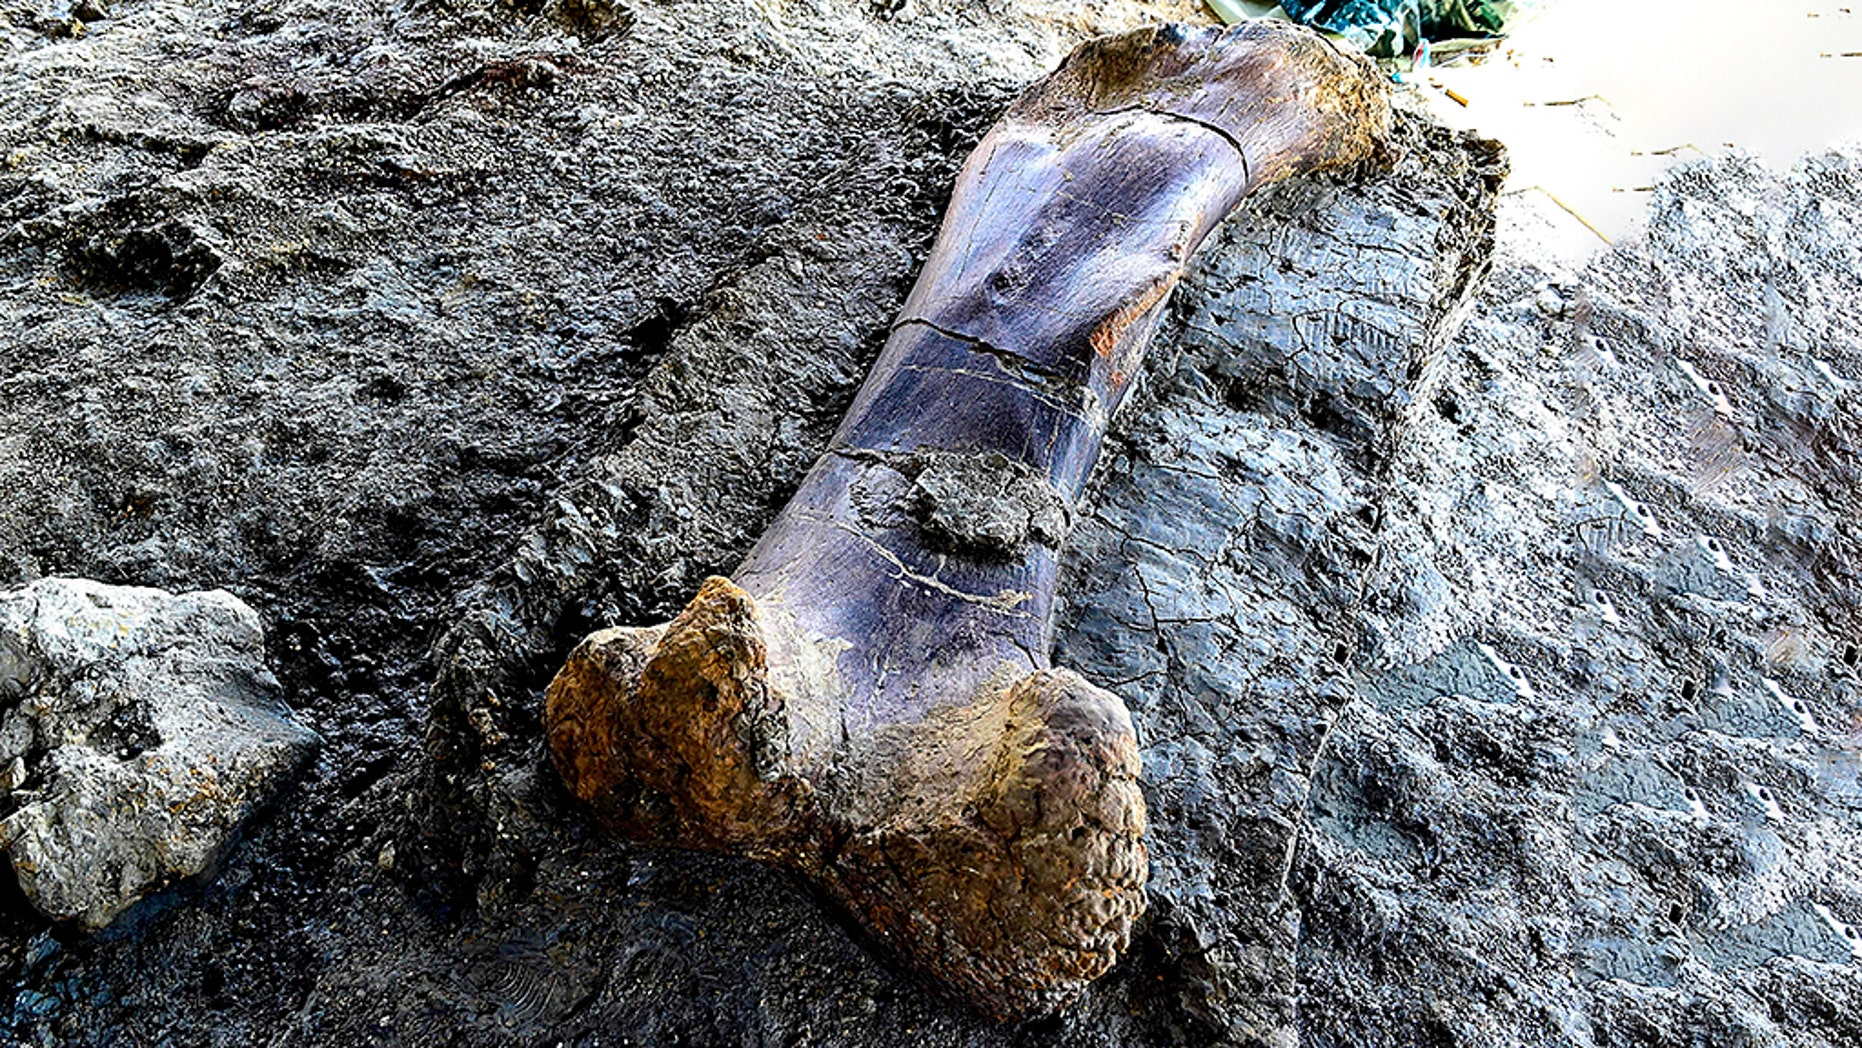 Telah Ditemukan Tulang Dinosaurus Raksasa Seberat 40 Ton, Terbesar di Dunia - Brondat.com